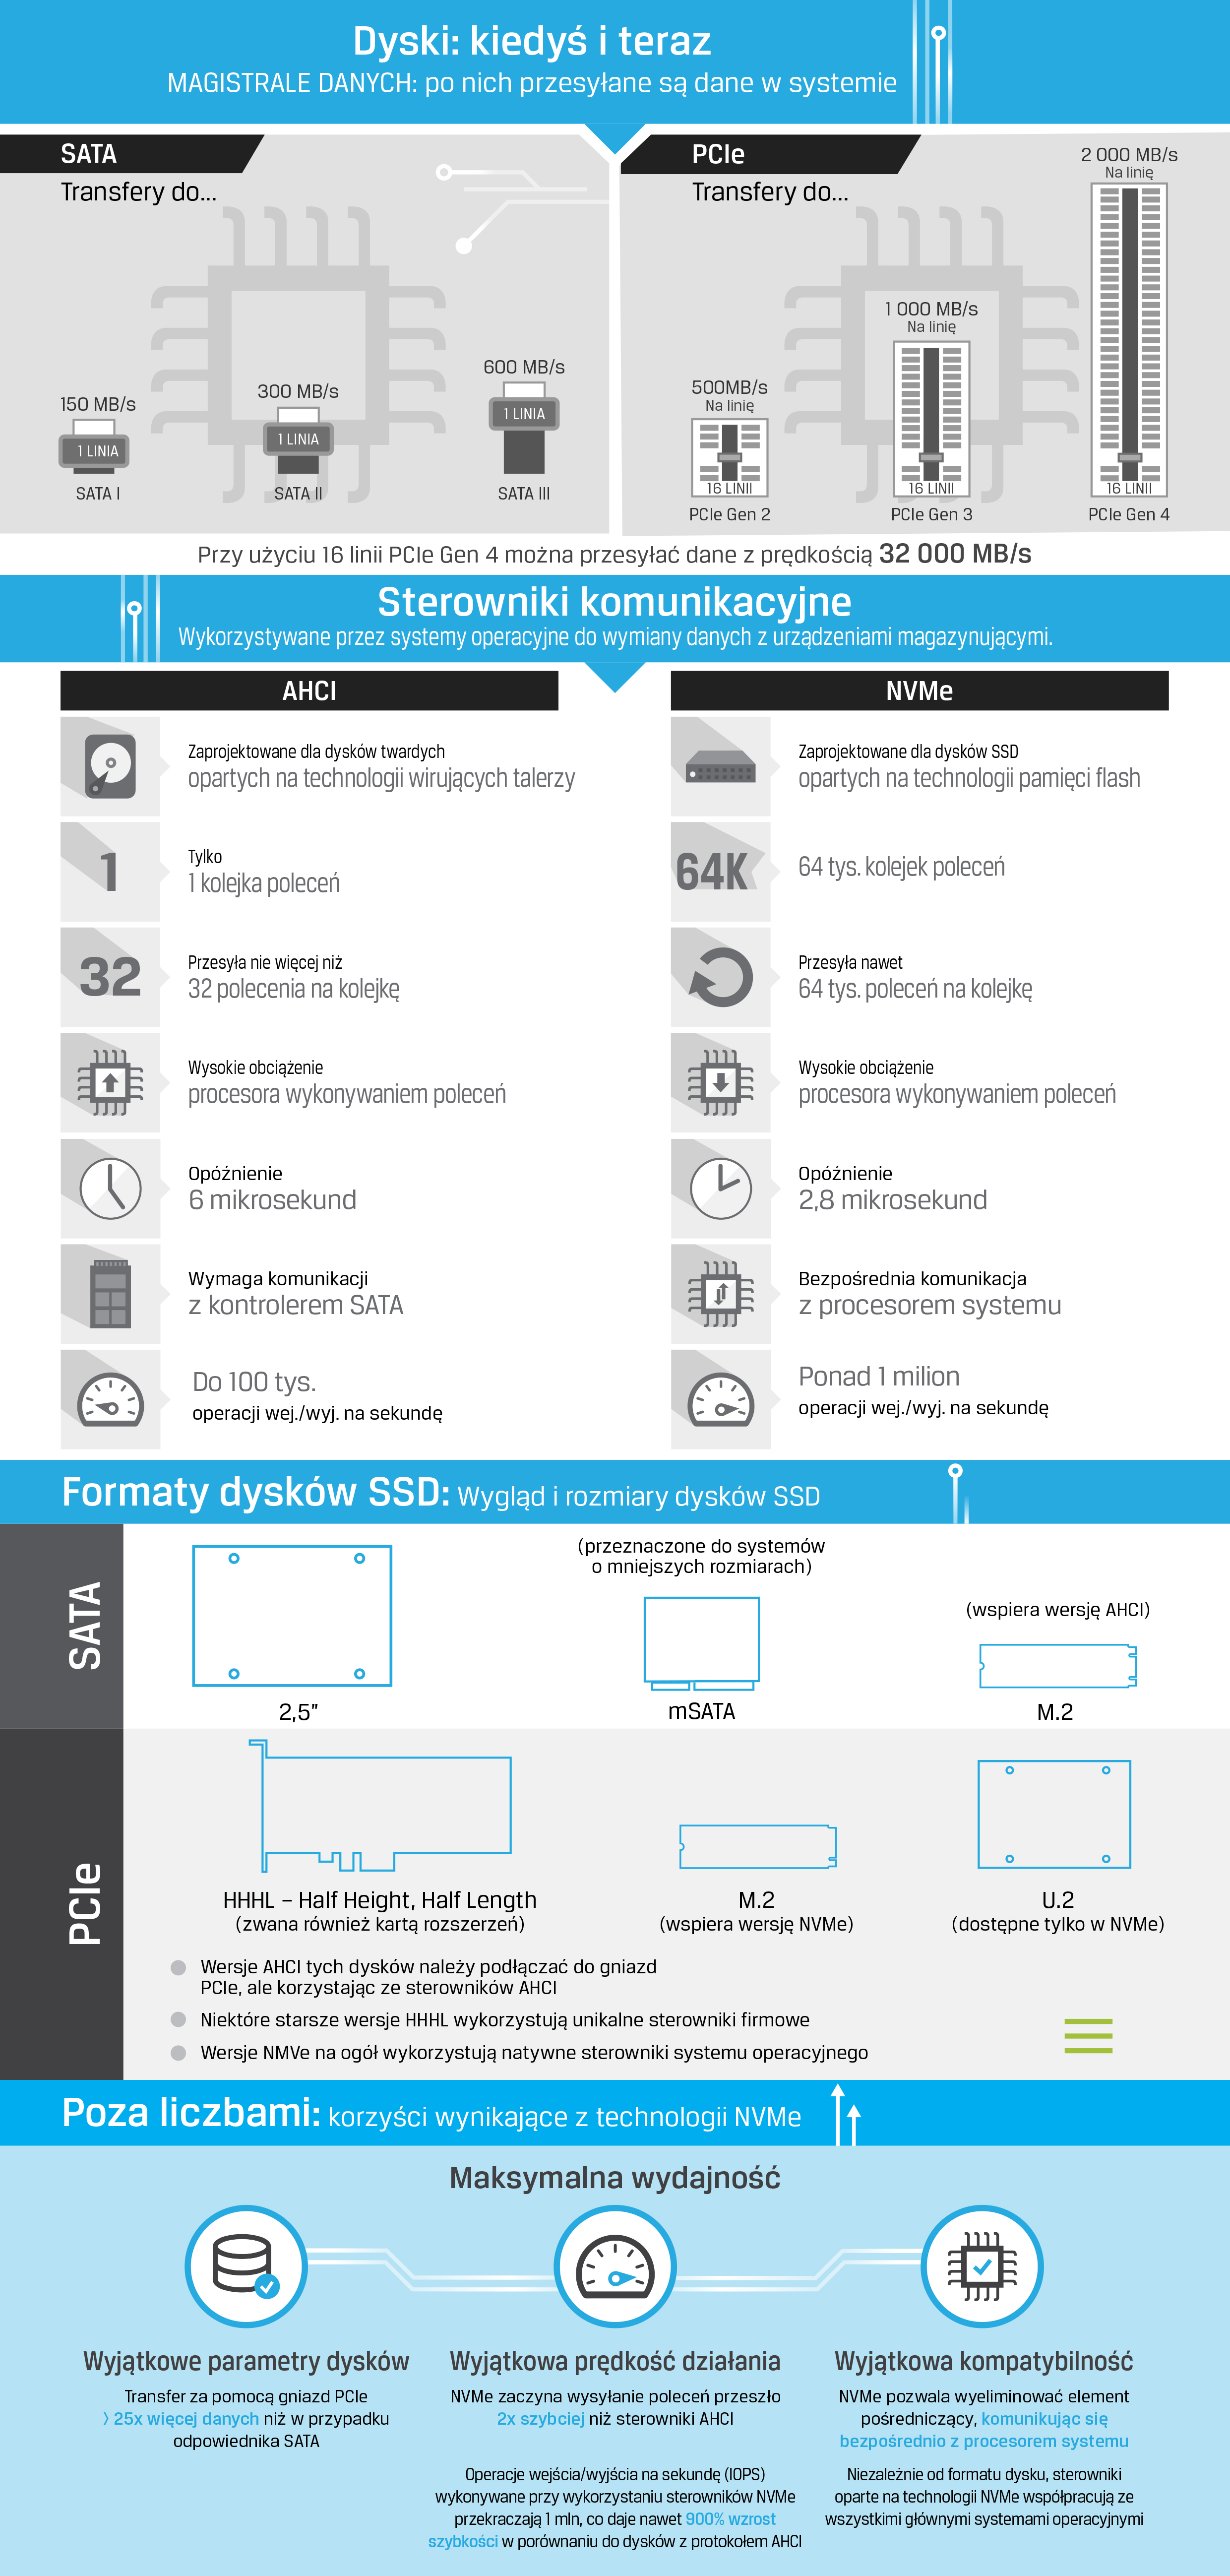 Infografika opisuje następujące technologie SSD: NVMe, SATA, PCIe, AHCI, M.2 i U.2